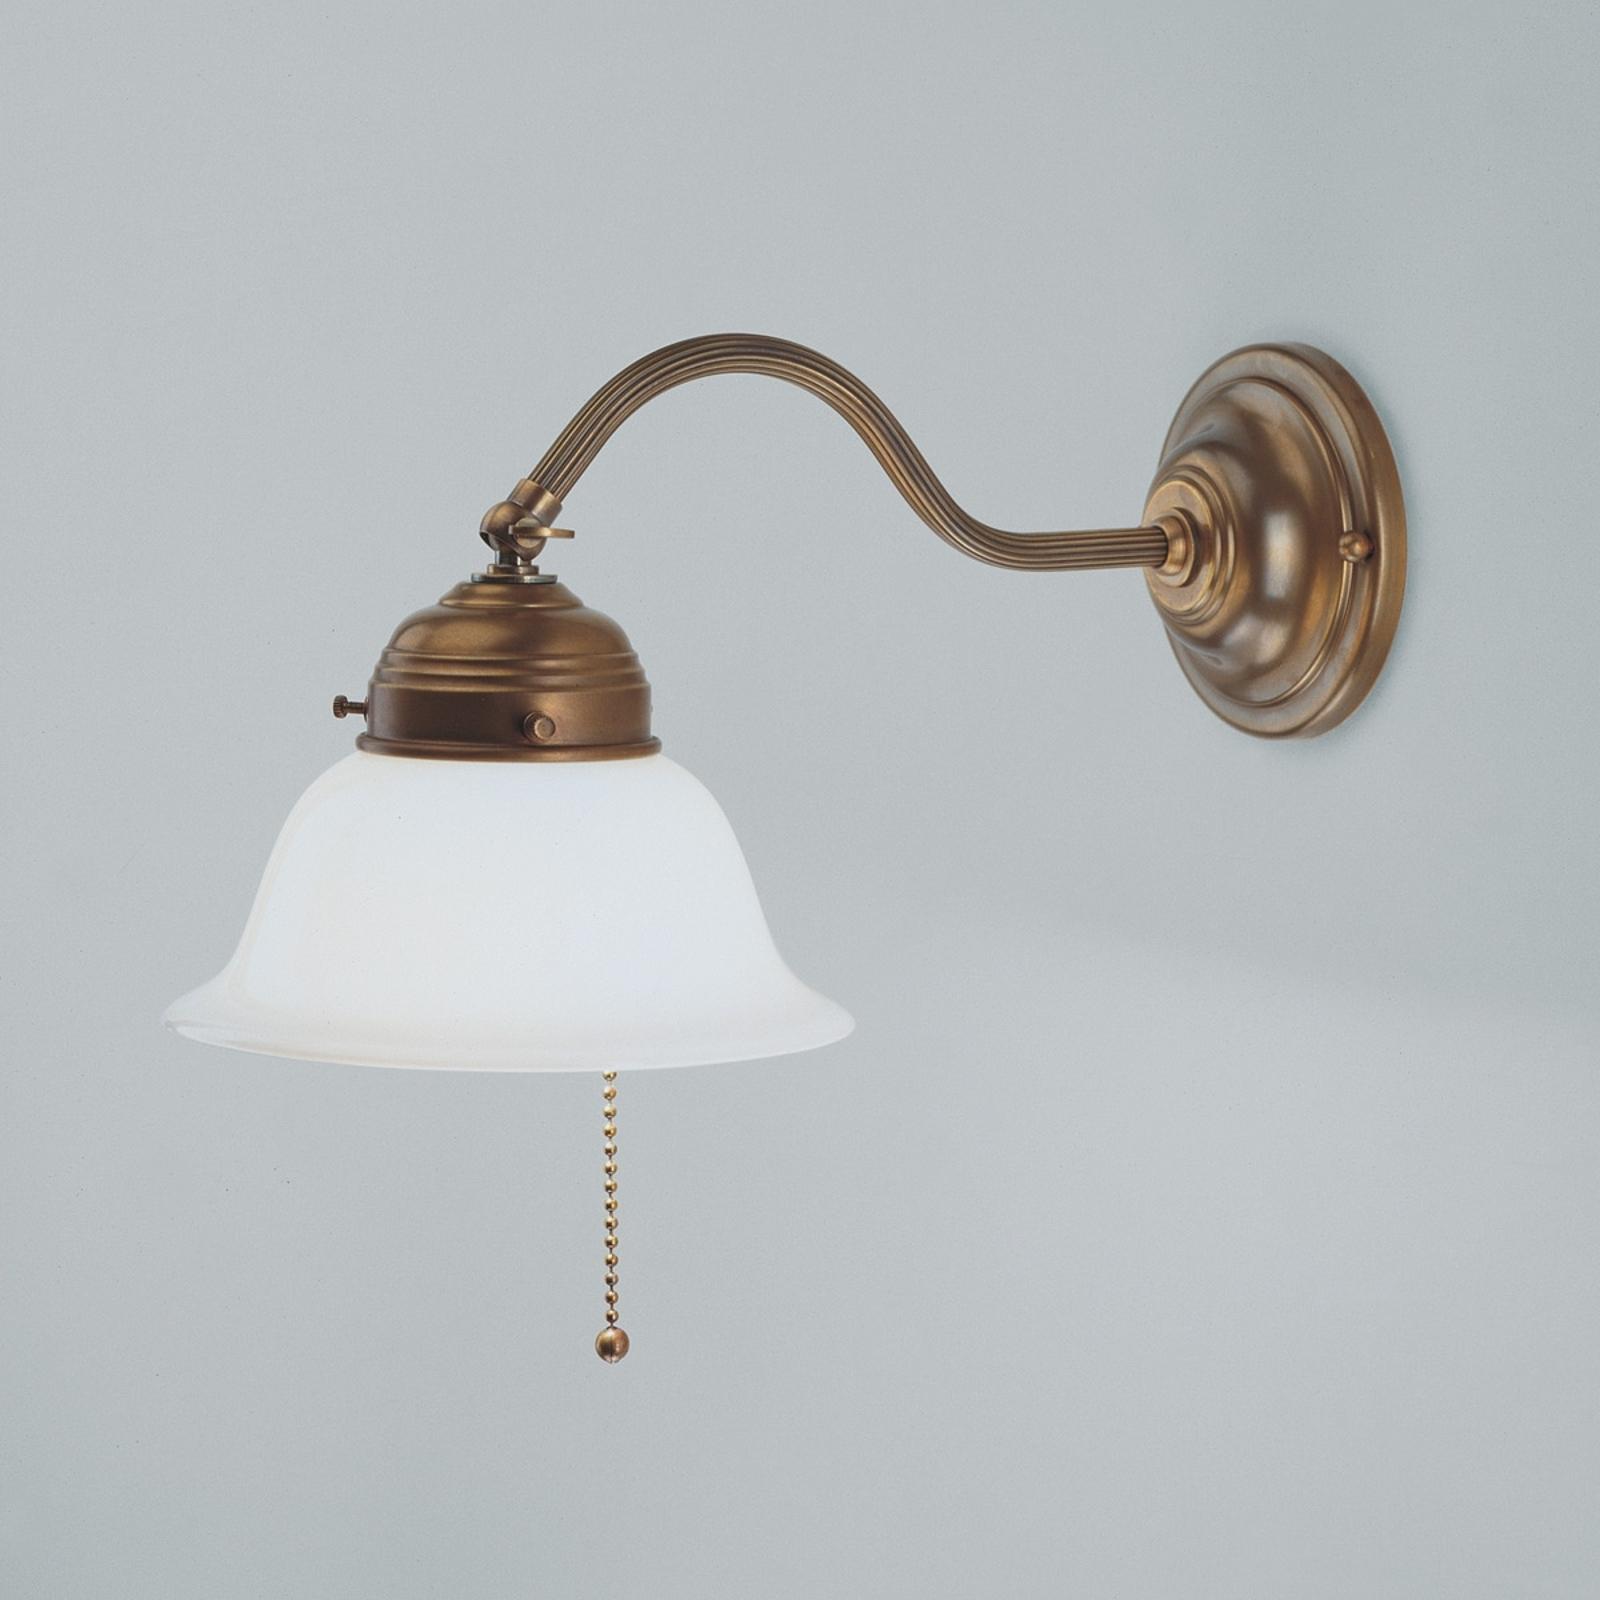 Boris wall light made of brass_1542096_1